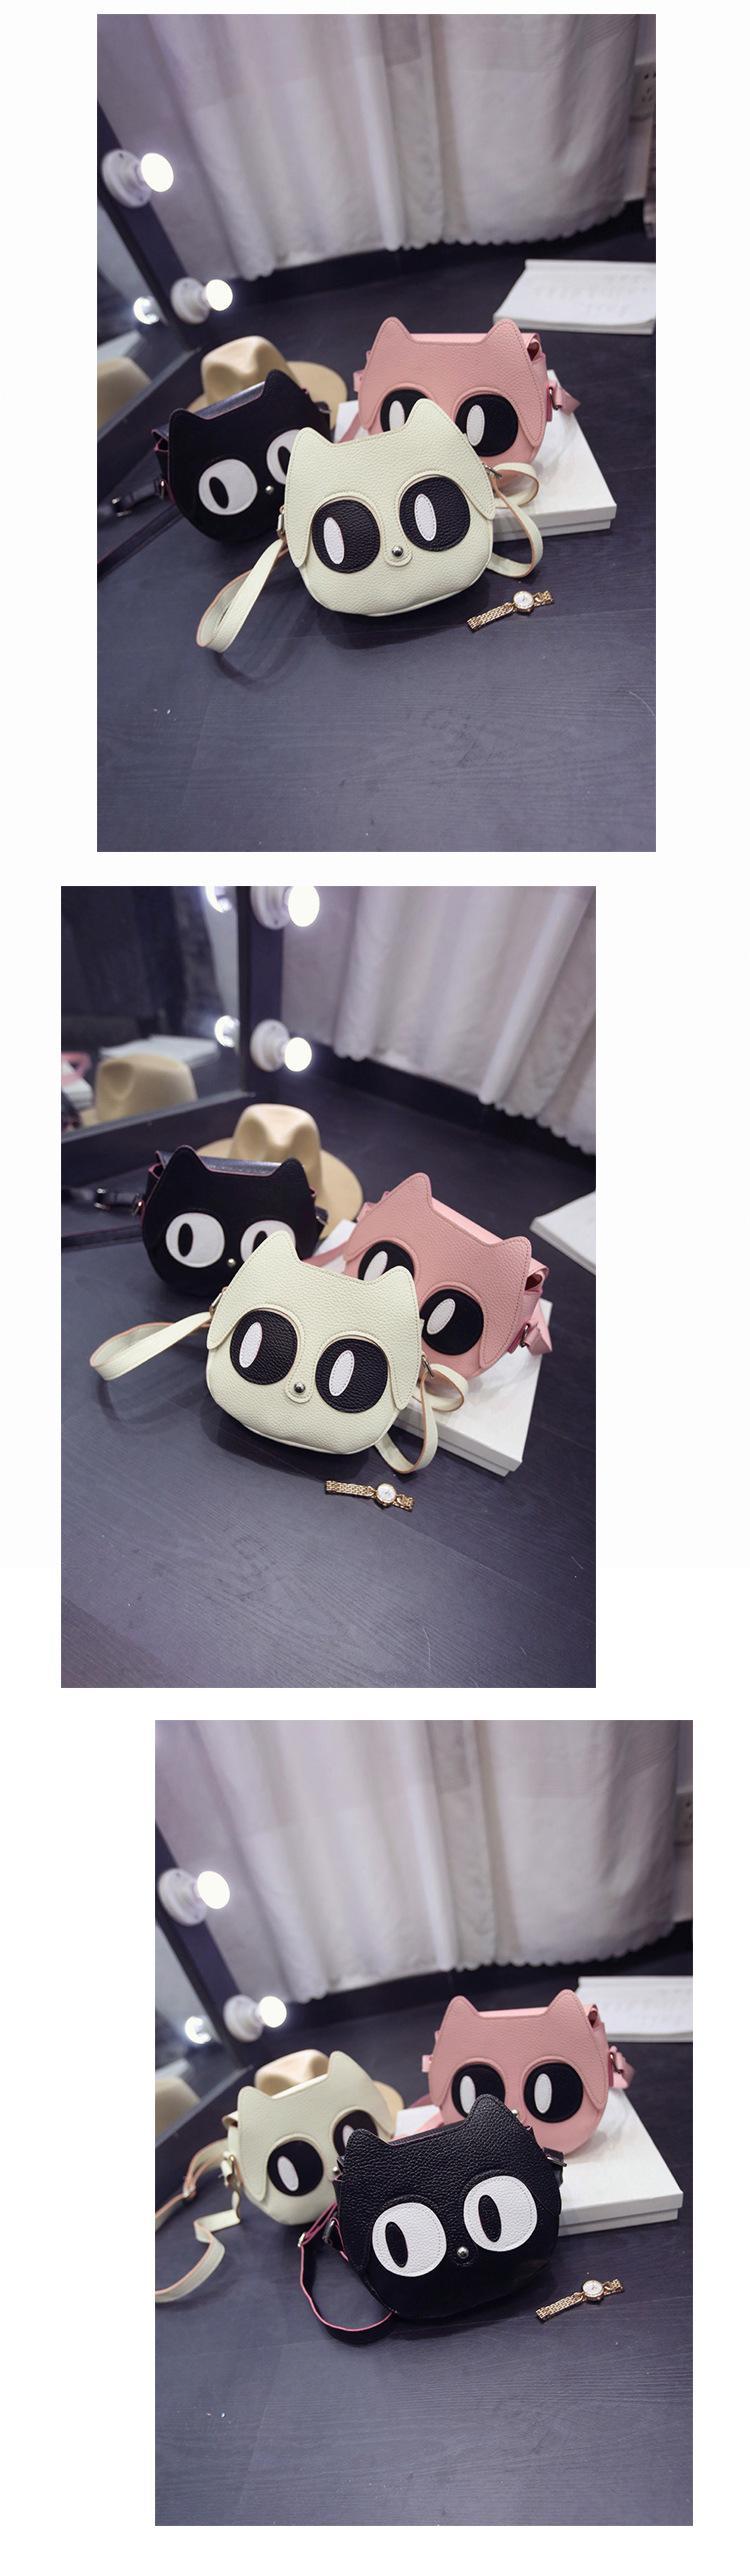 wholesale Cartoon printing Women bag Female PU leather Mini Crossbody Shoulder bags Girls Messenger bag children kids cute purse